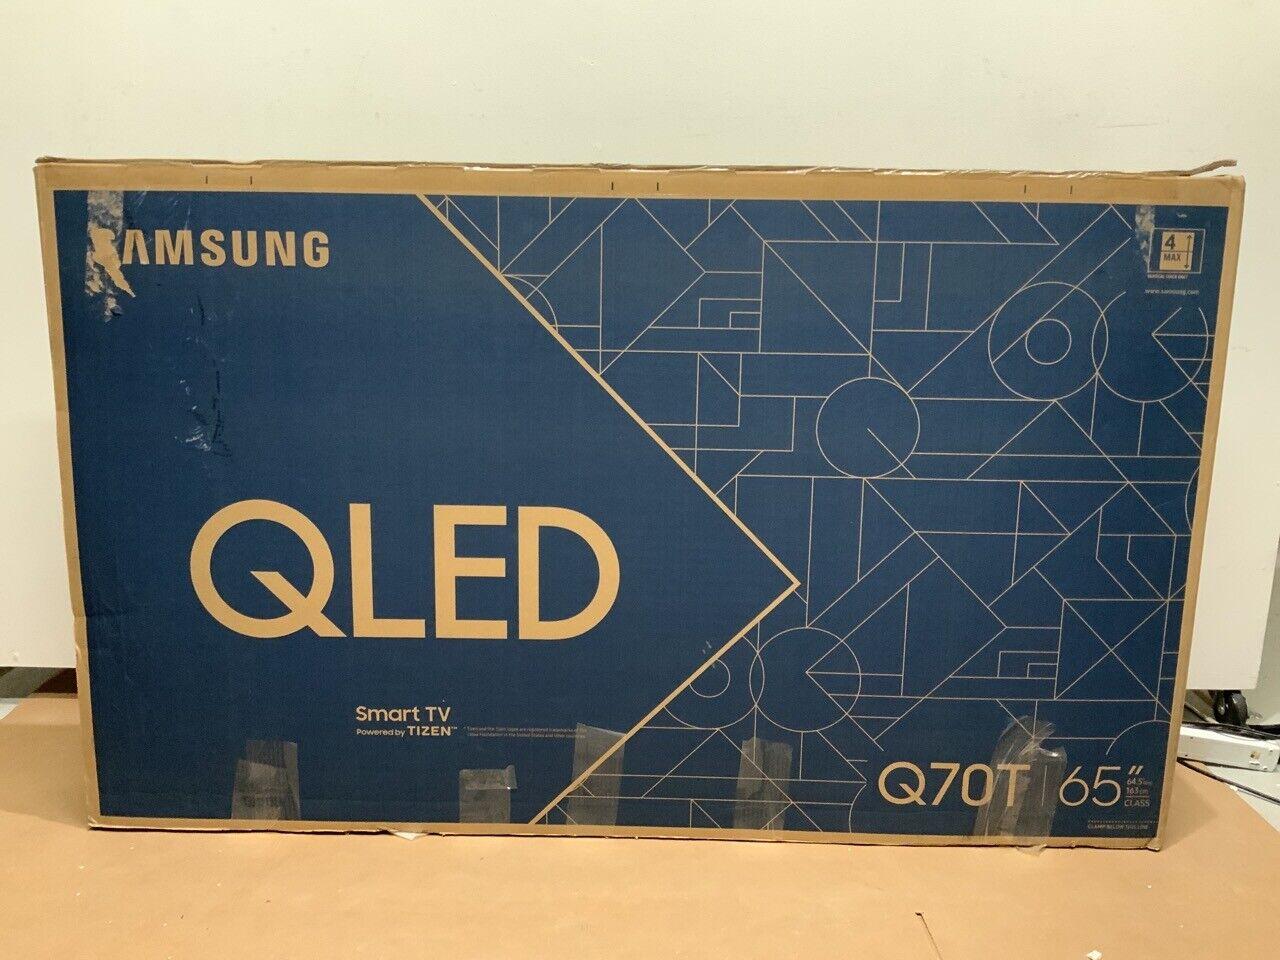 ⭐ Samsung QN65Q70TA QLED 65 Quantum 4K UHD HDR Smart TV QN65Q70TAFXZA 2020 ❤️. Available Now for 899.99